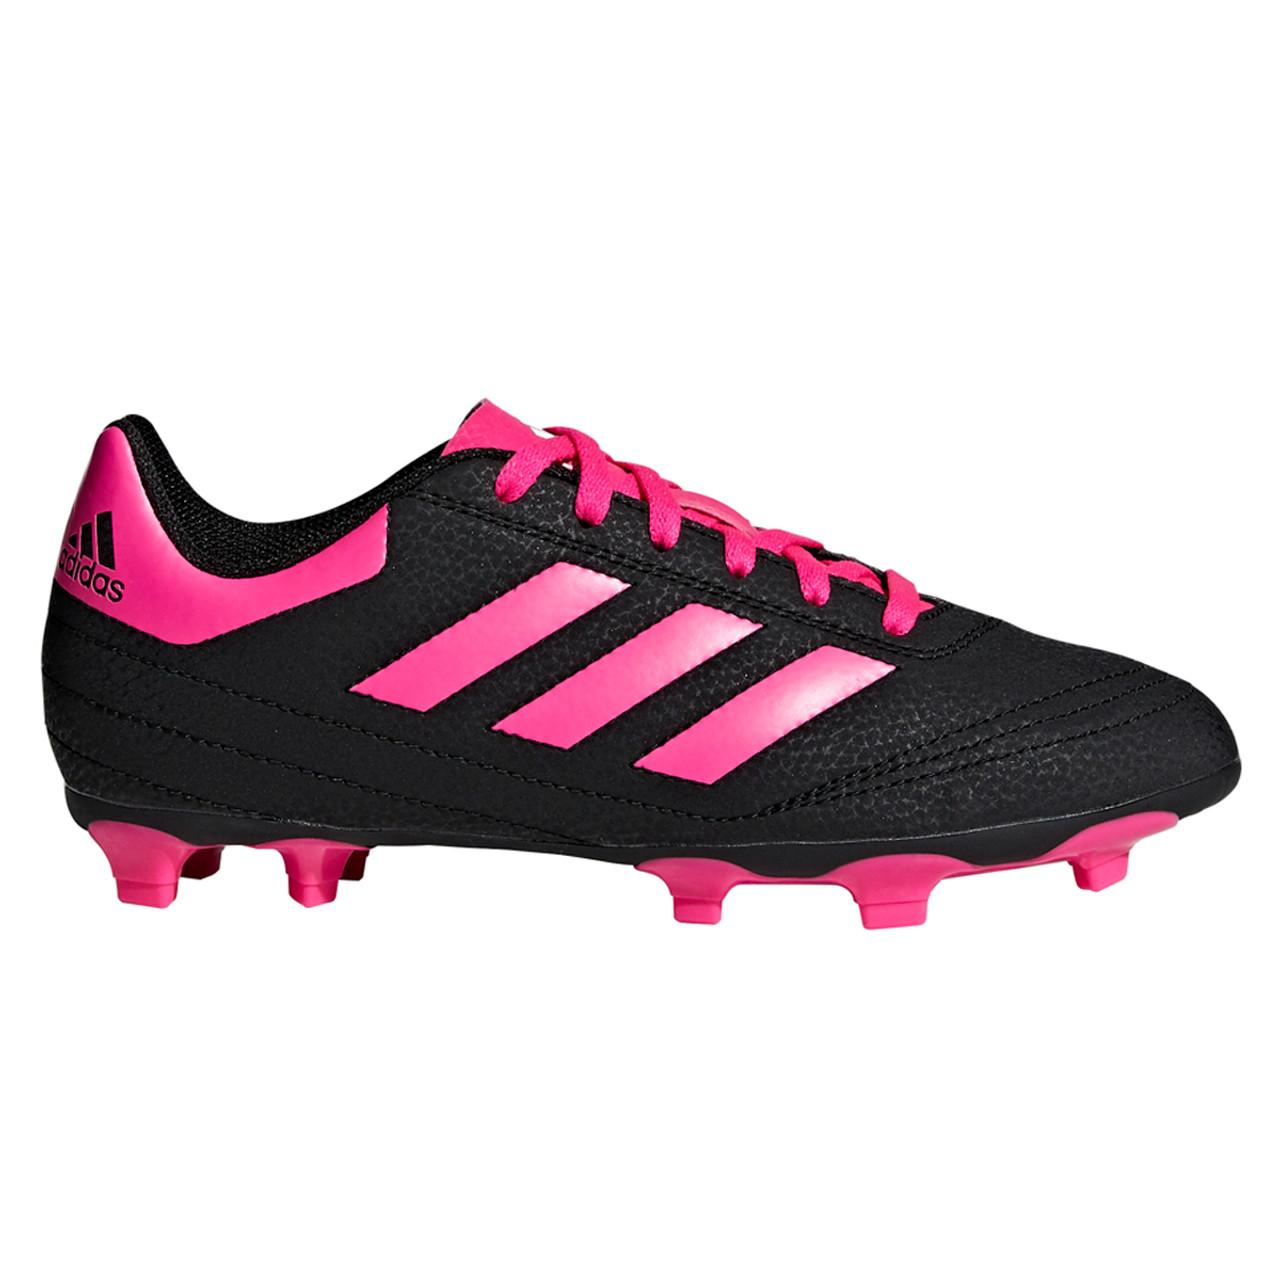 5abb9396cf0 Adidas Goletto VI FG Junior Youth Soccer Cleats G26368 - Black